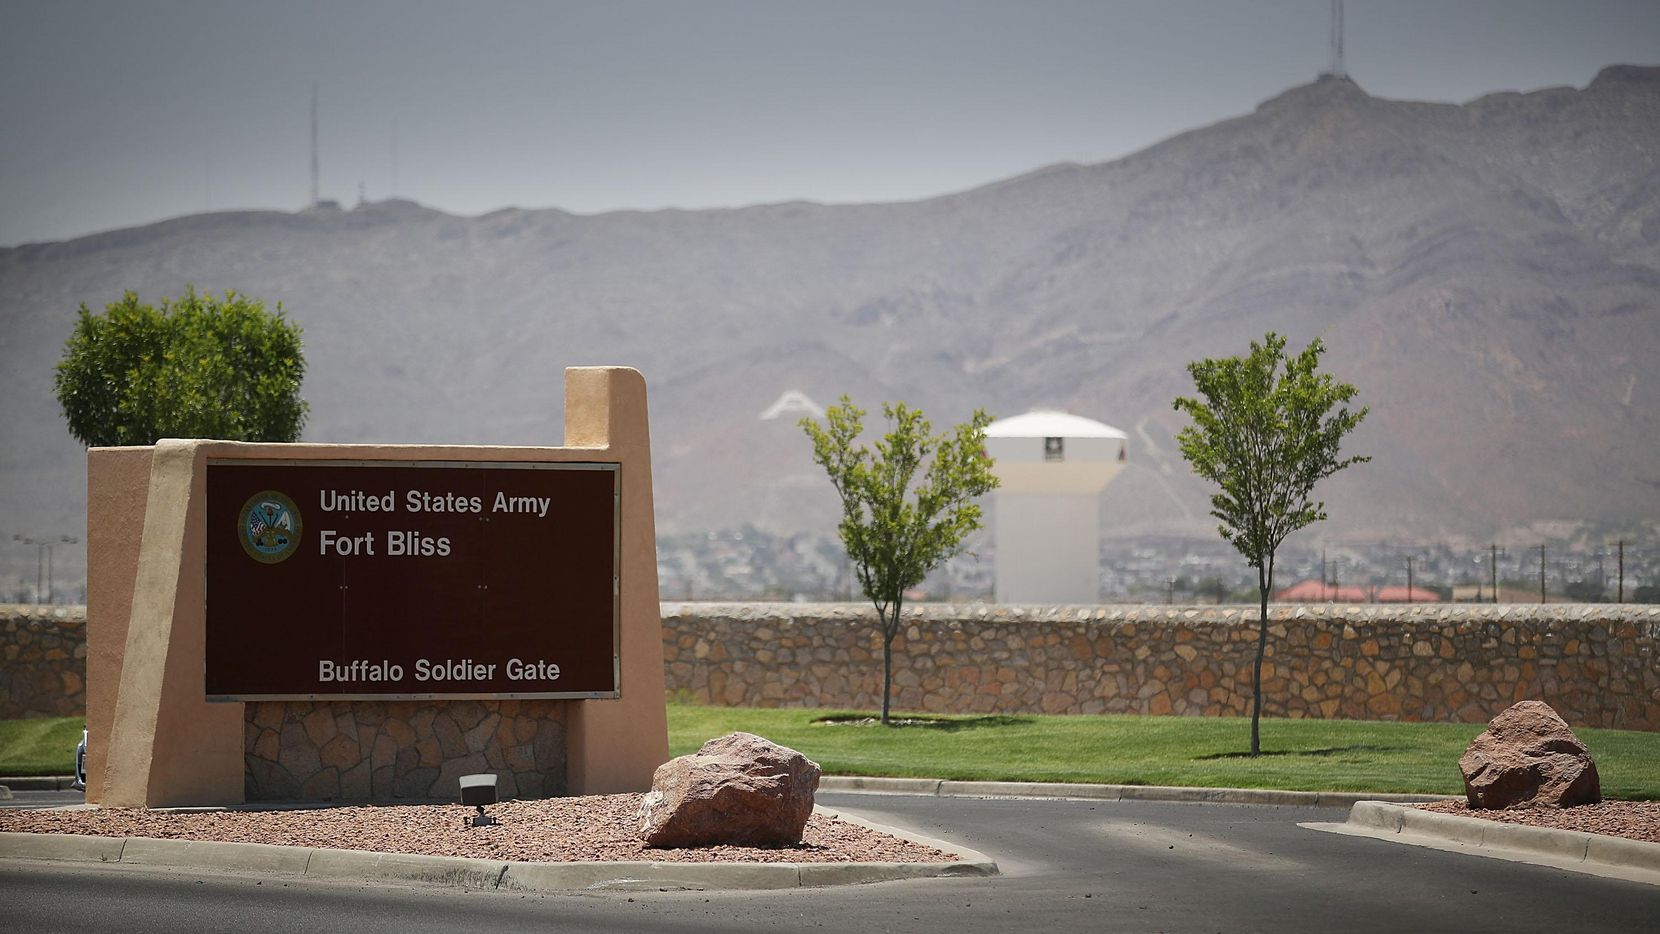 La entrada a la base militar Fort Bliss en El Paso, Texas. (GETTY IMAGES/JOE RAEDLE)